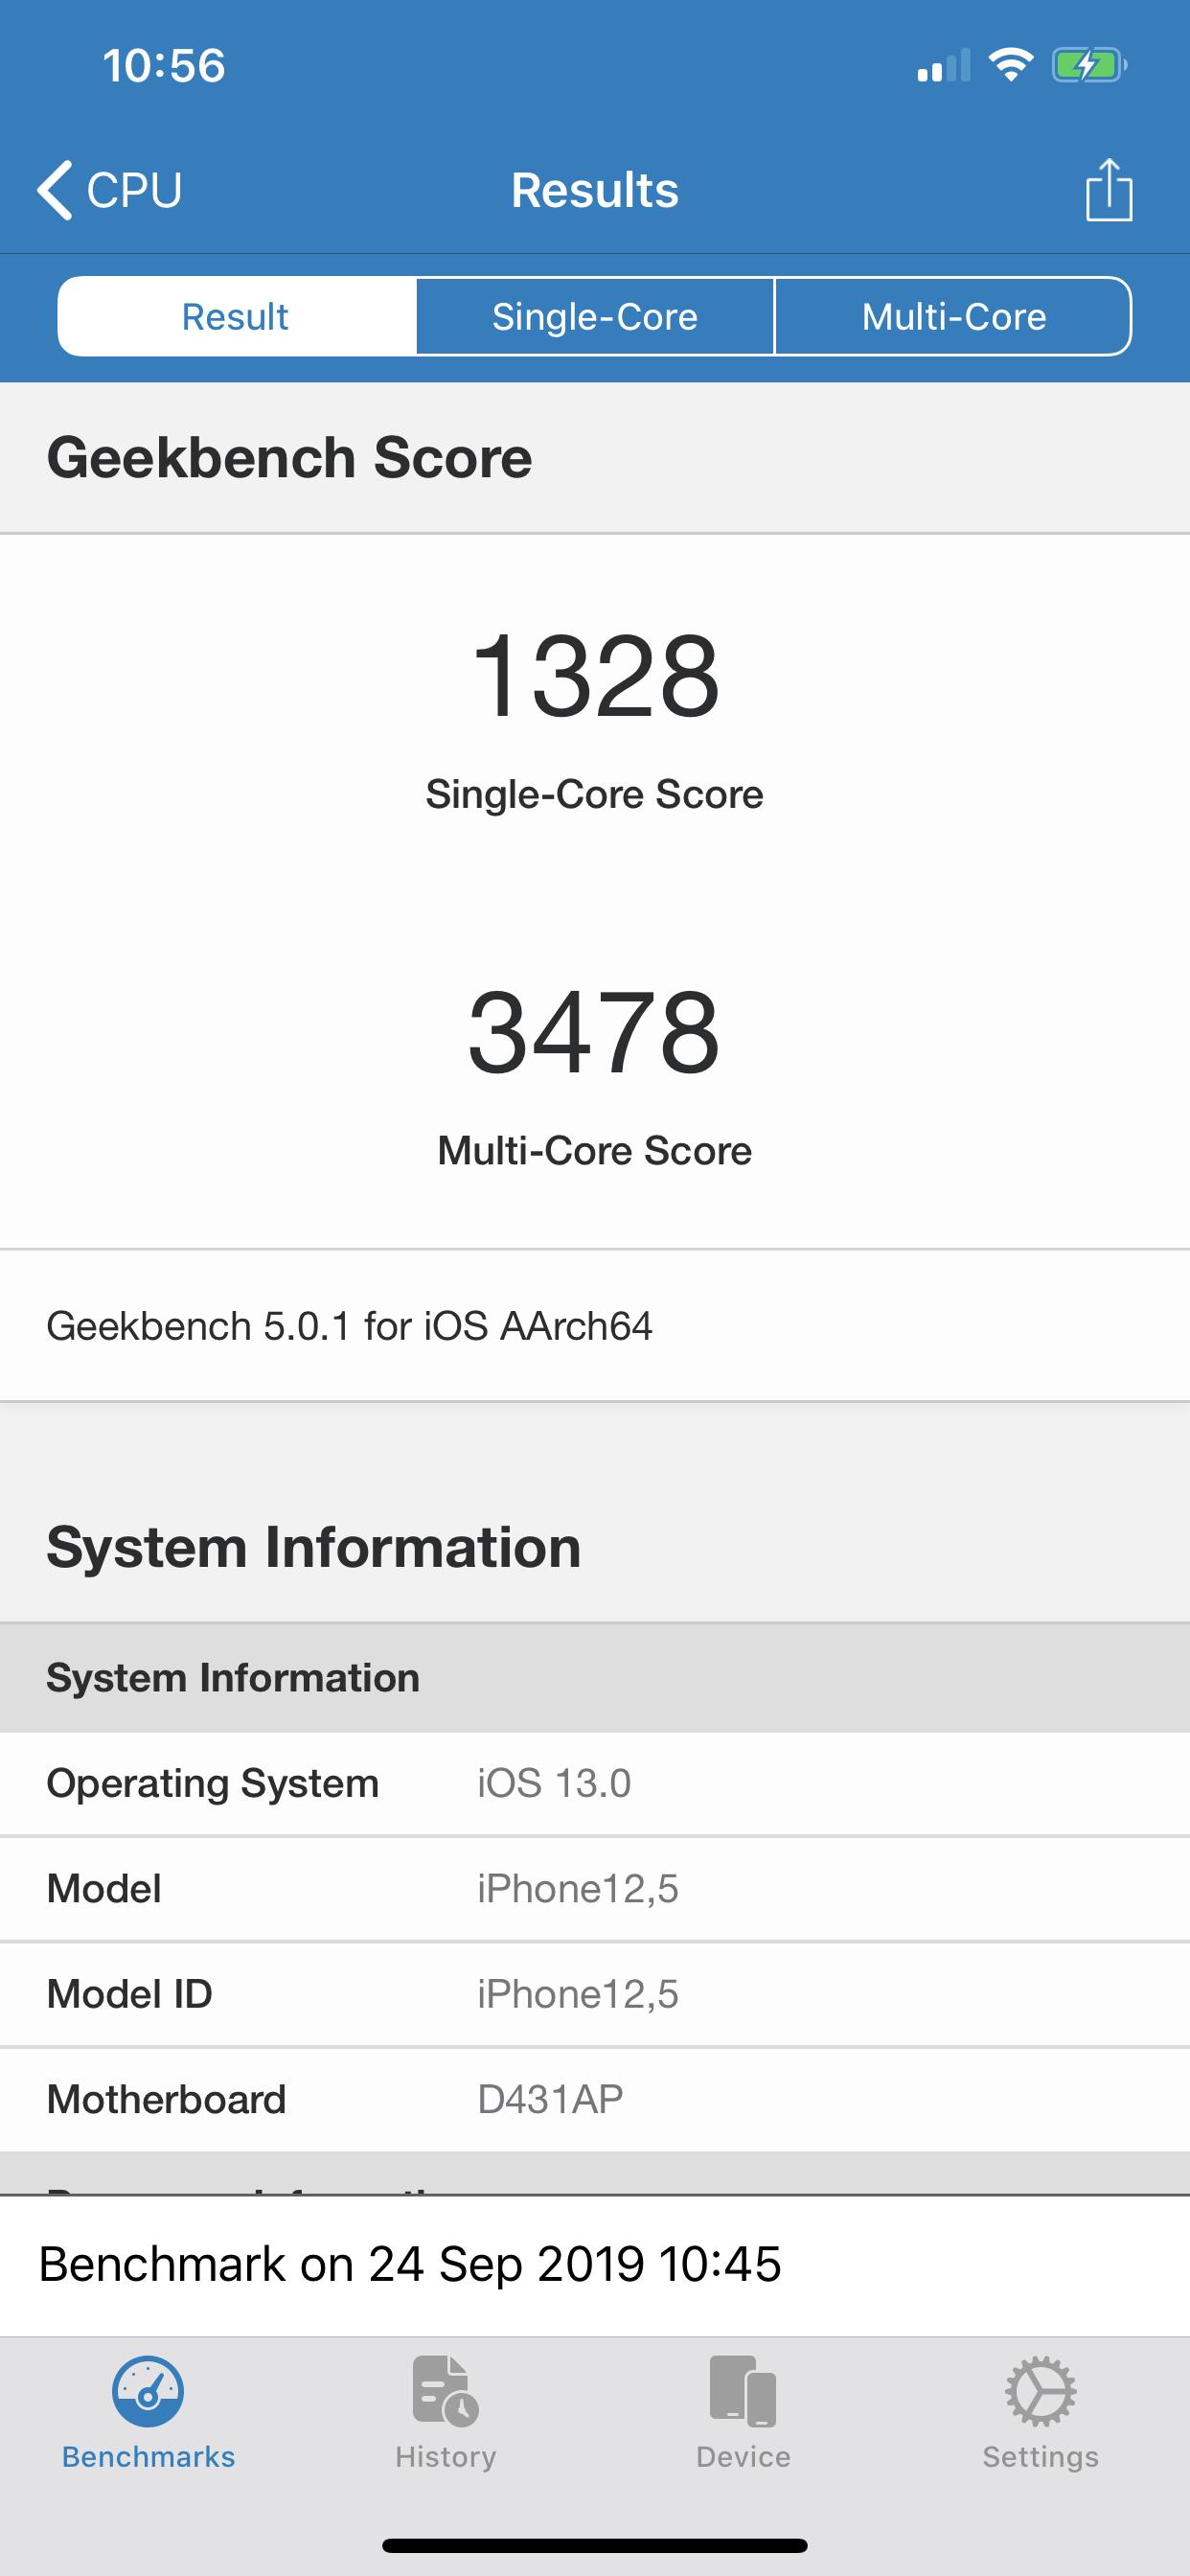 Pixel 4 XL vs iPhone 11 Pro Max - iphone 11 pro max geekbench 5